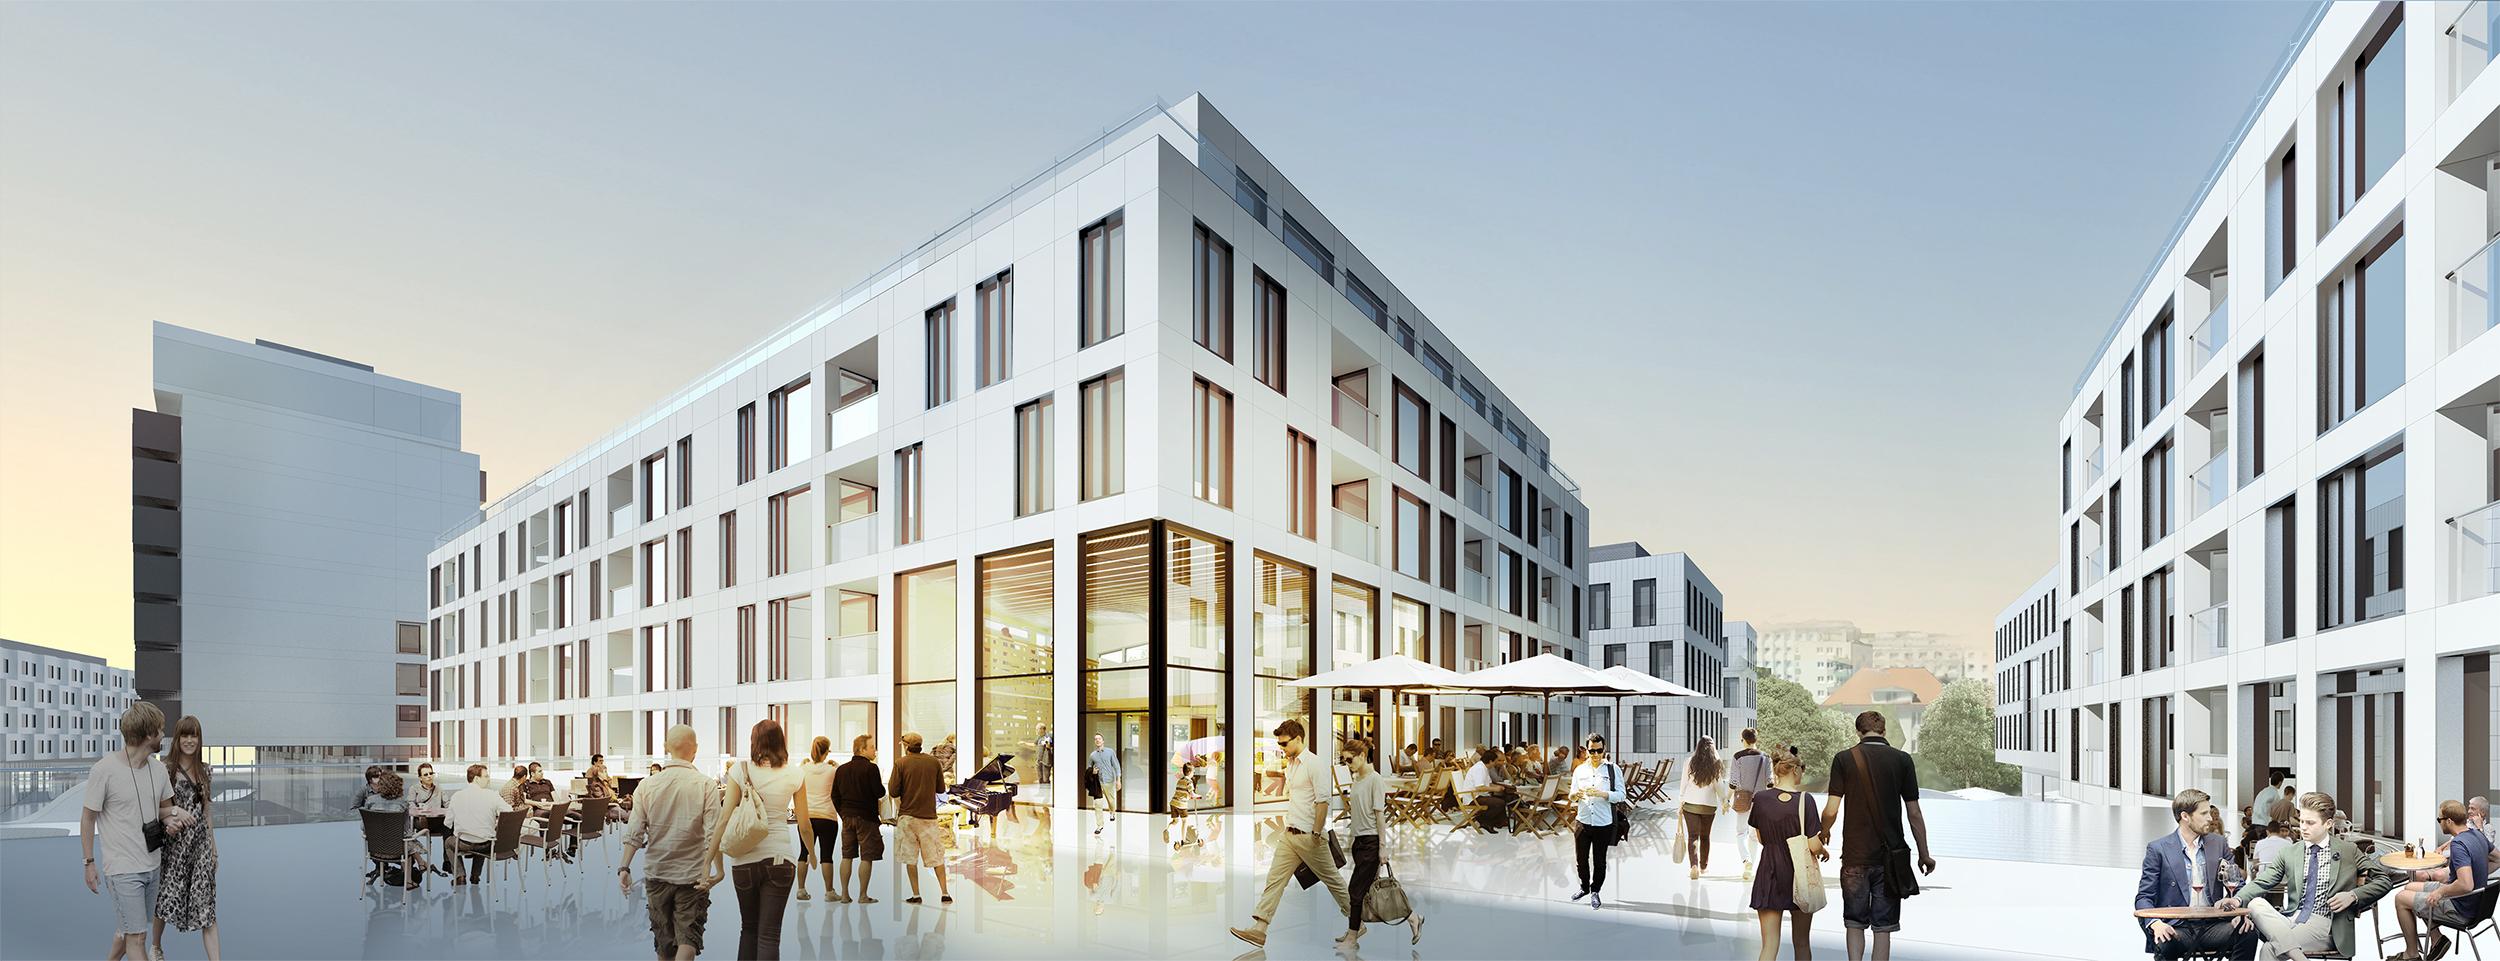 GDYNIA-Waterfront-Housing-MJZ-5